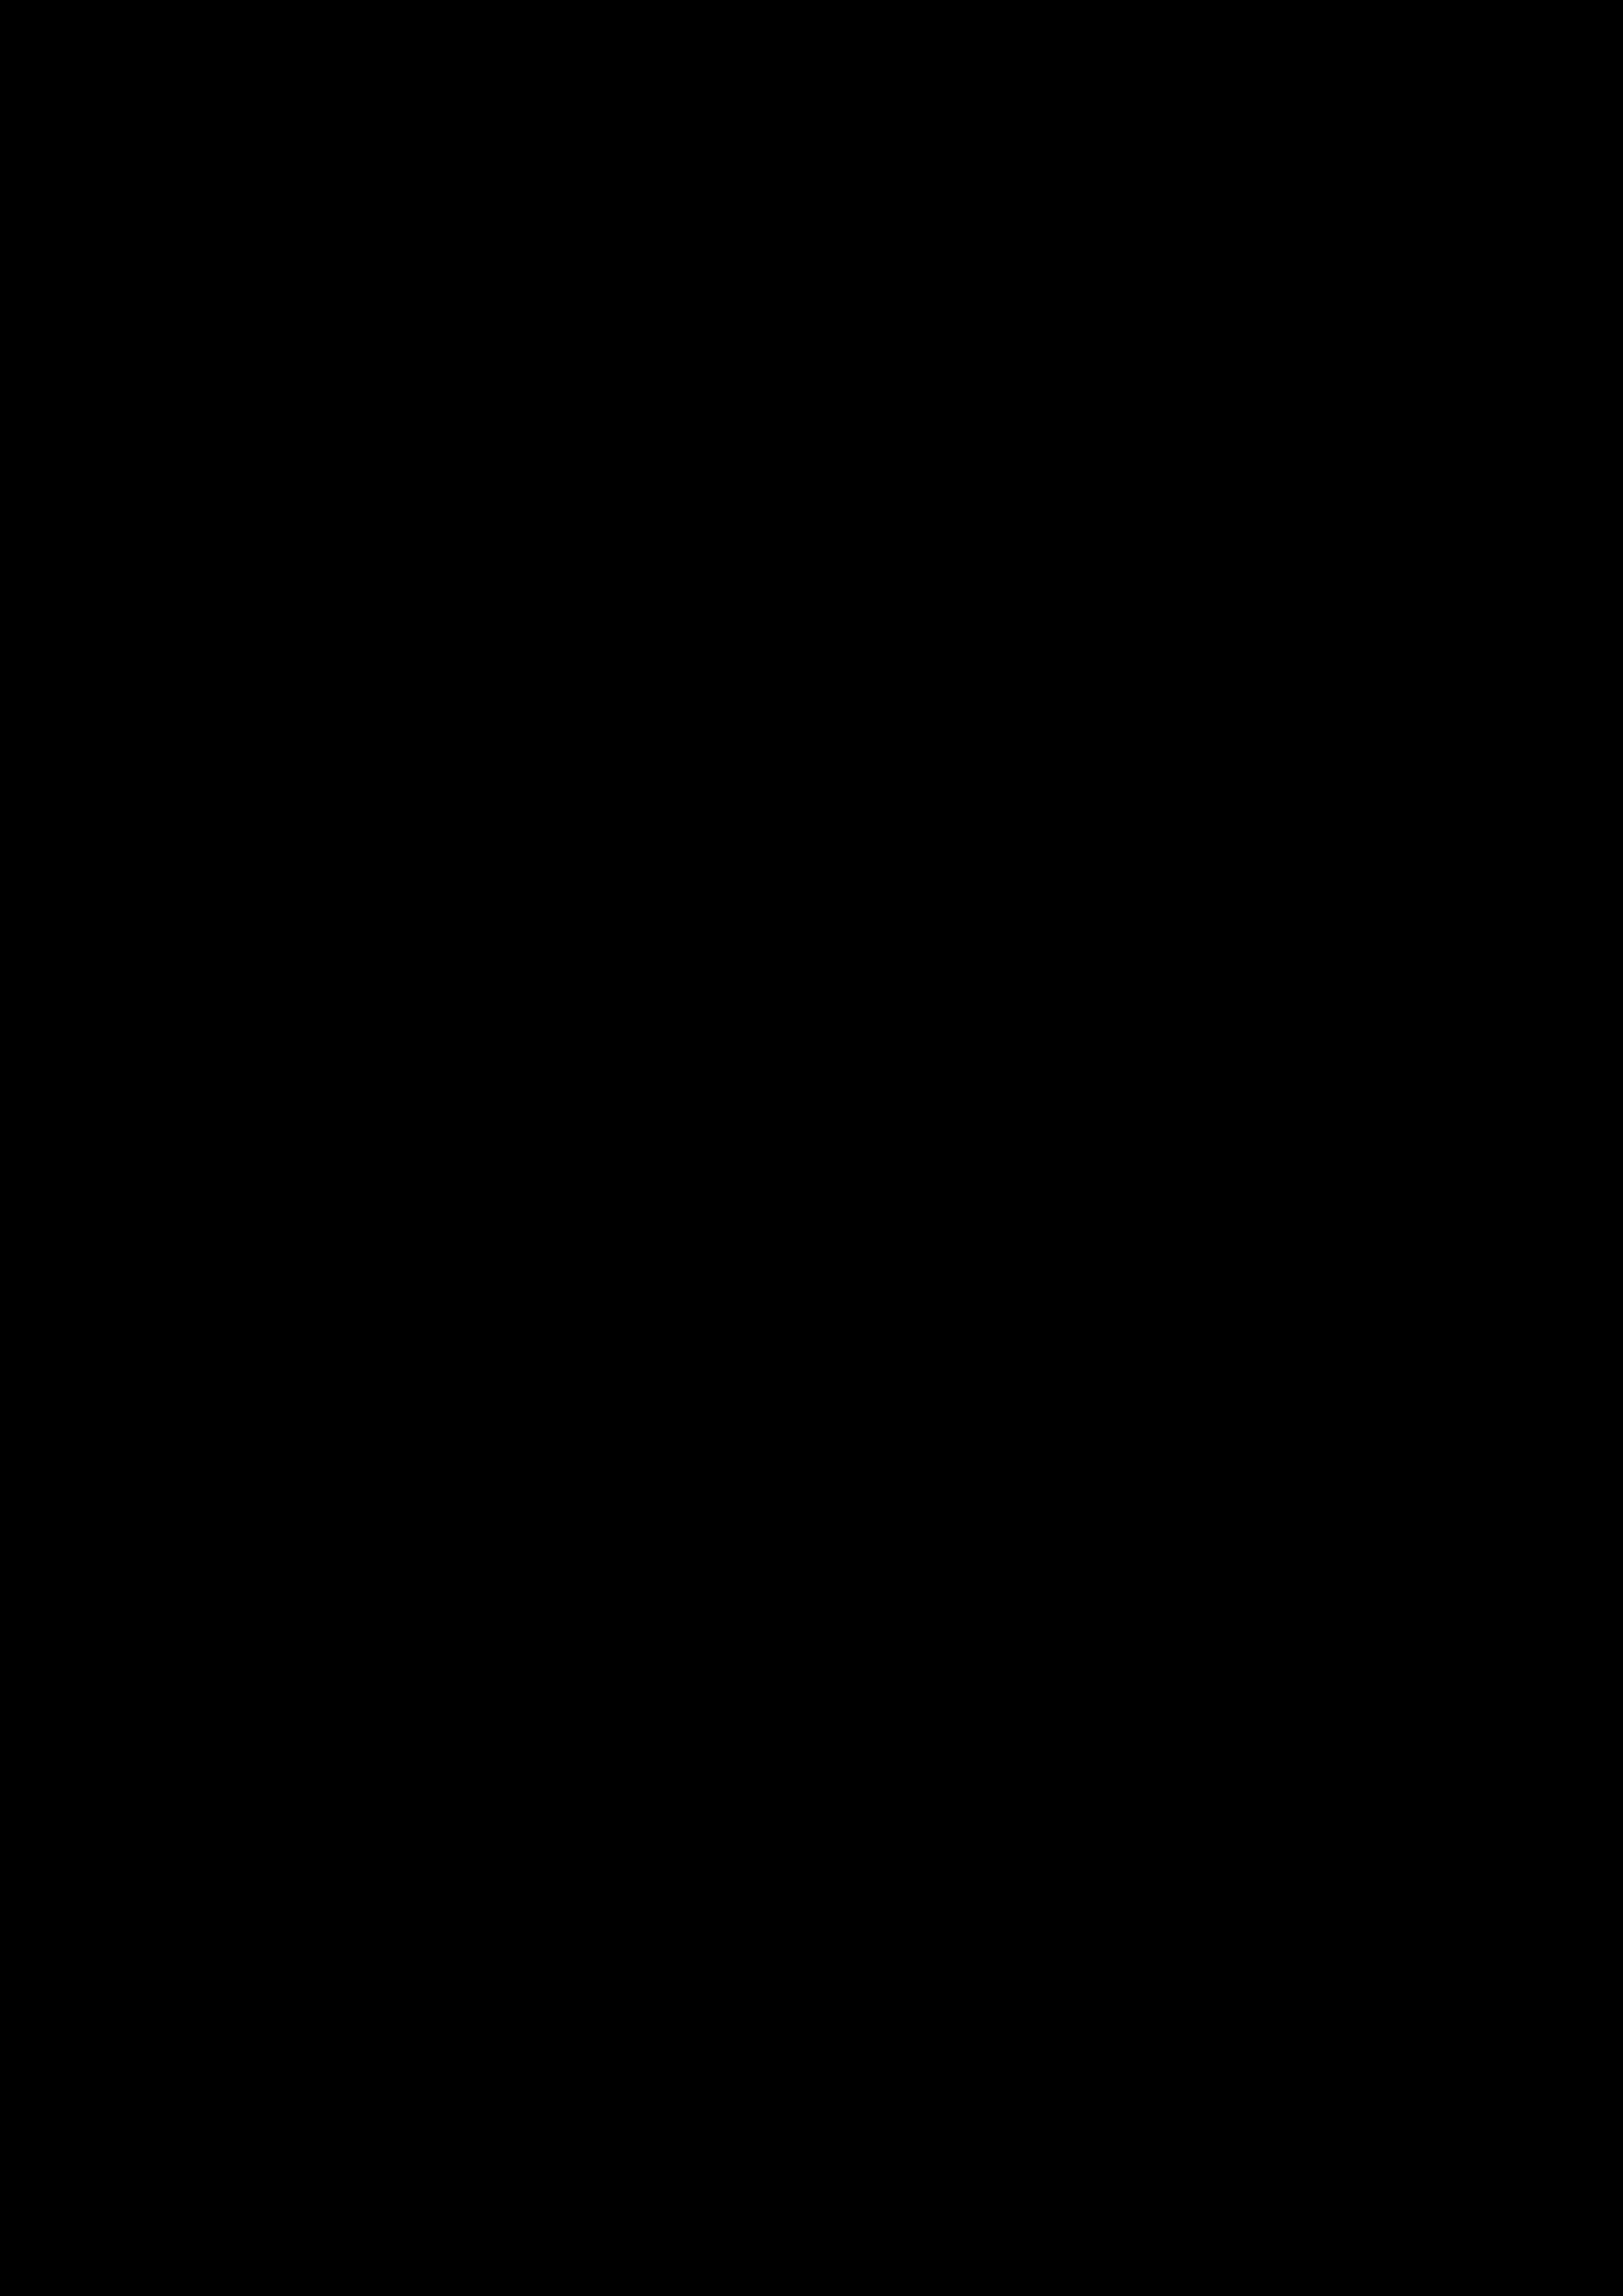 Chess Symbols Set additionally Santander Bank Logo as well Traktor besides Love furthermore Equivalent. on love symbol